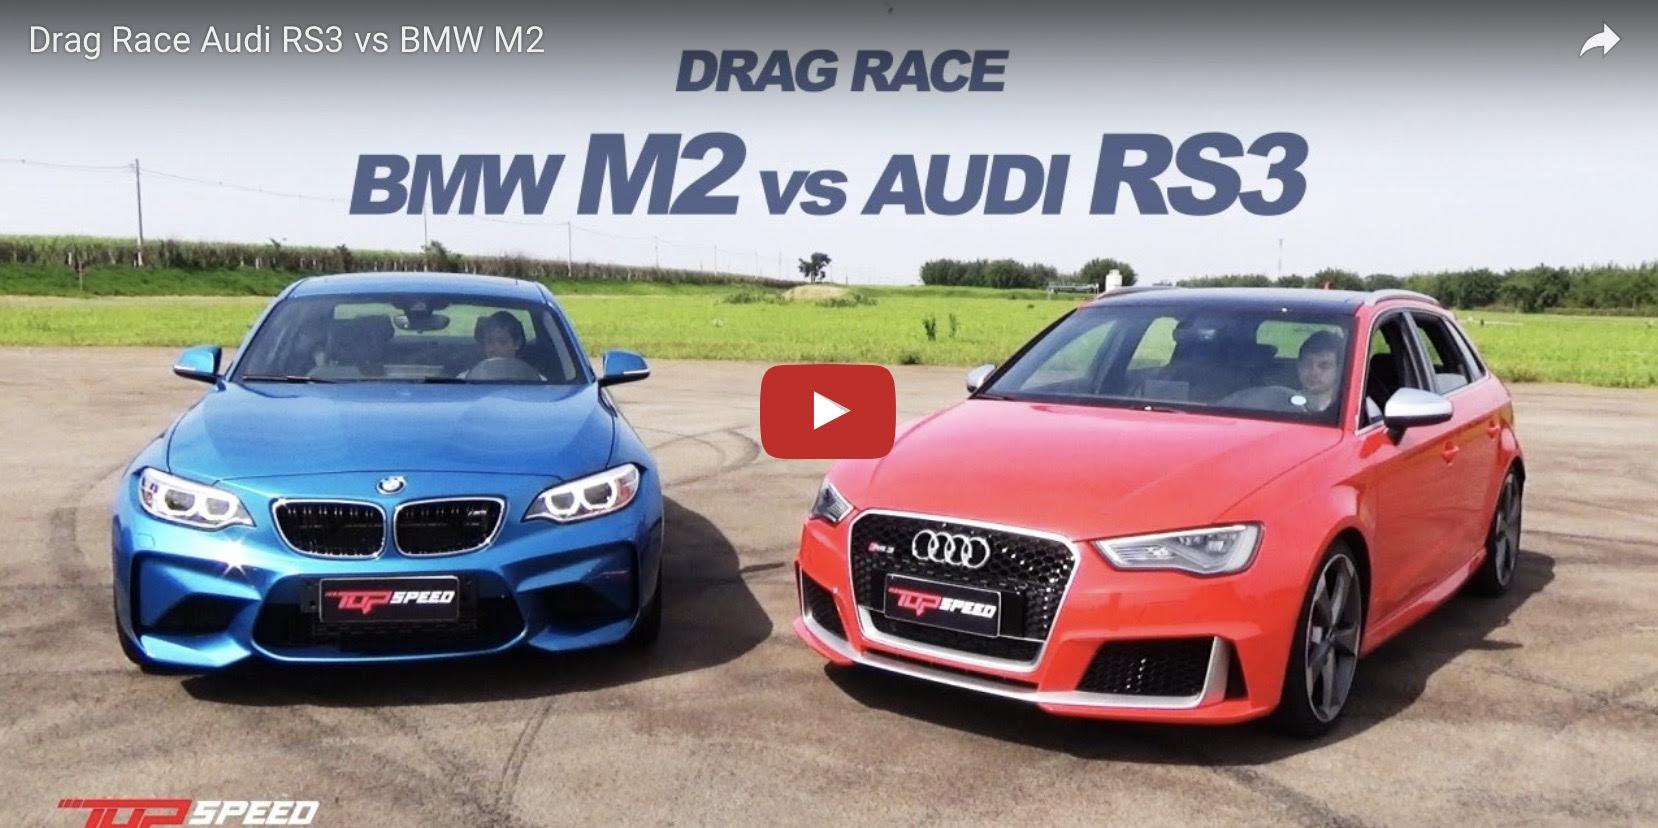 Bmw M3 Vs Audi Rs3 Drag Race